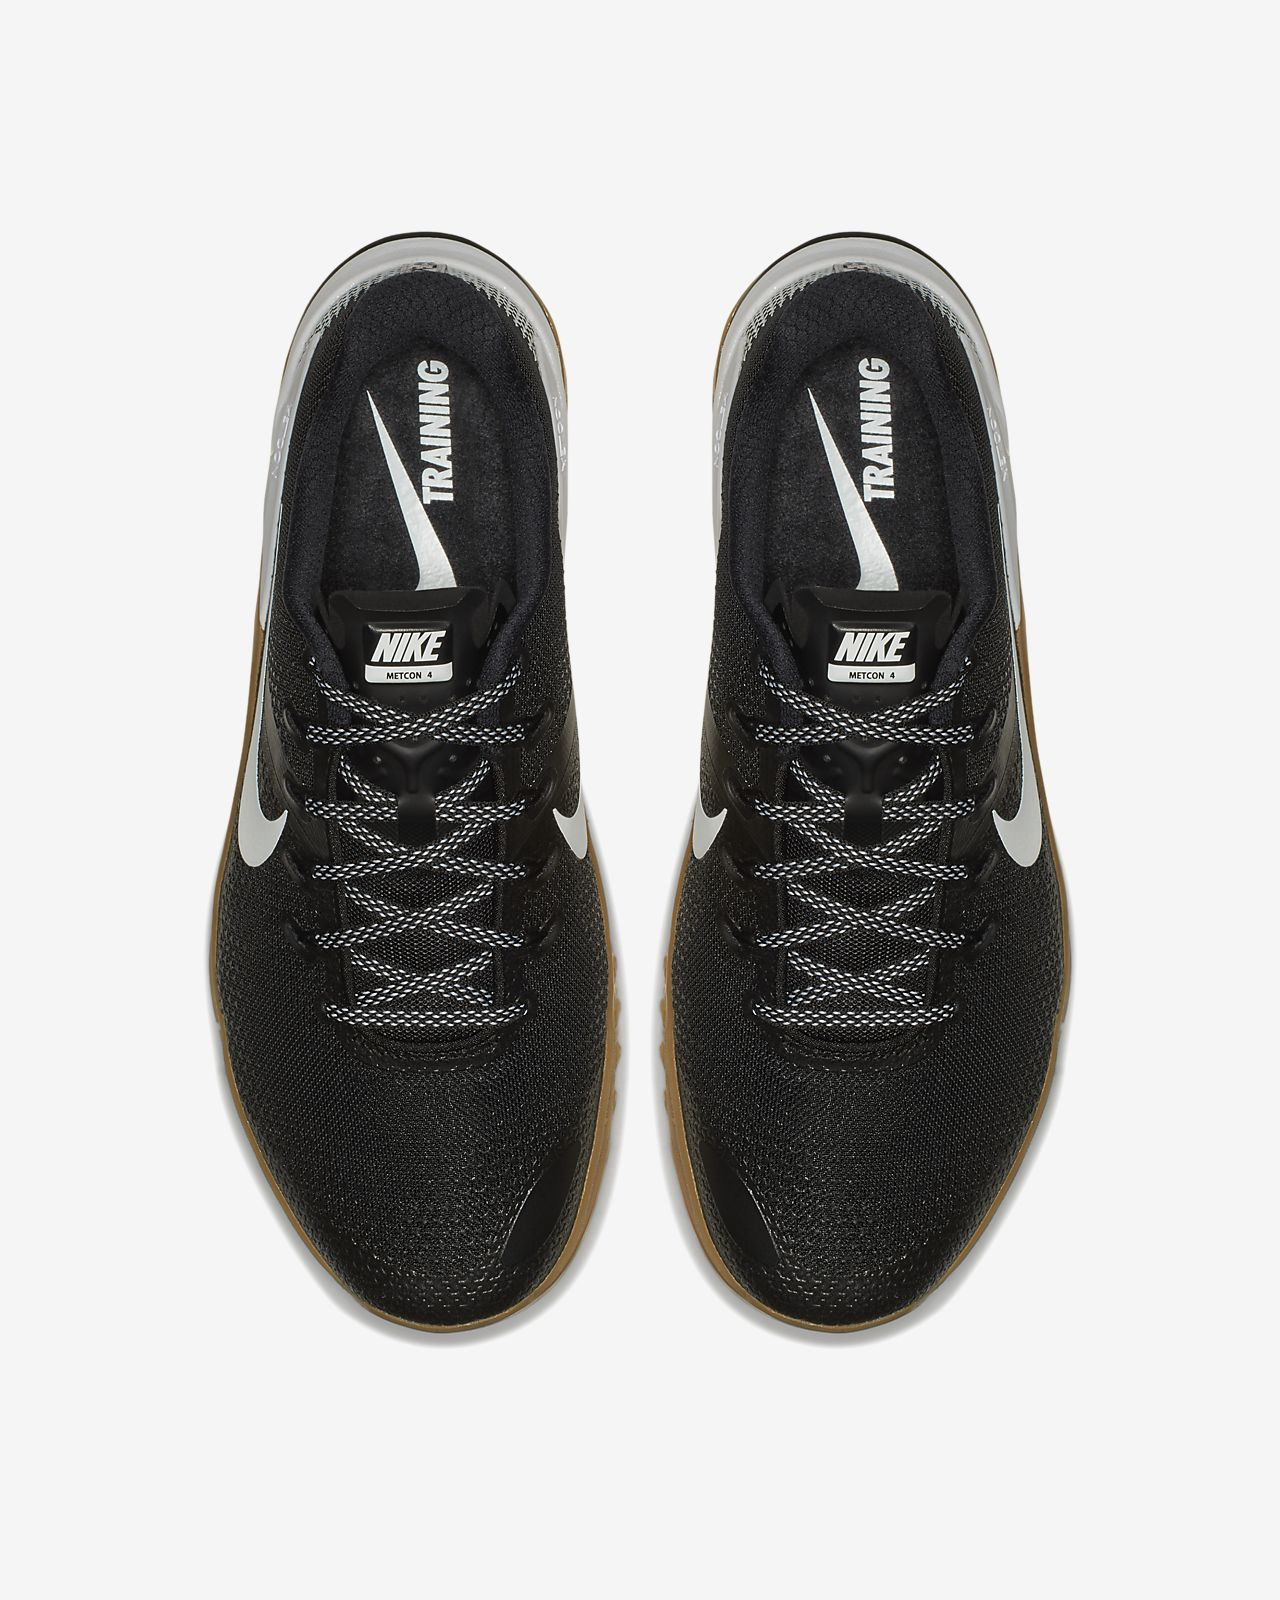 e5b2b24069fe Nike Metcon 4 Men s Cross Training Weightlifting Shoe. Nike.com AU